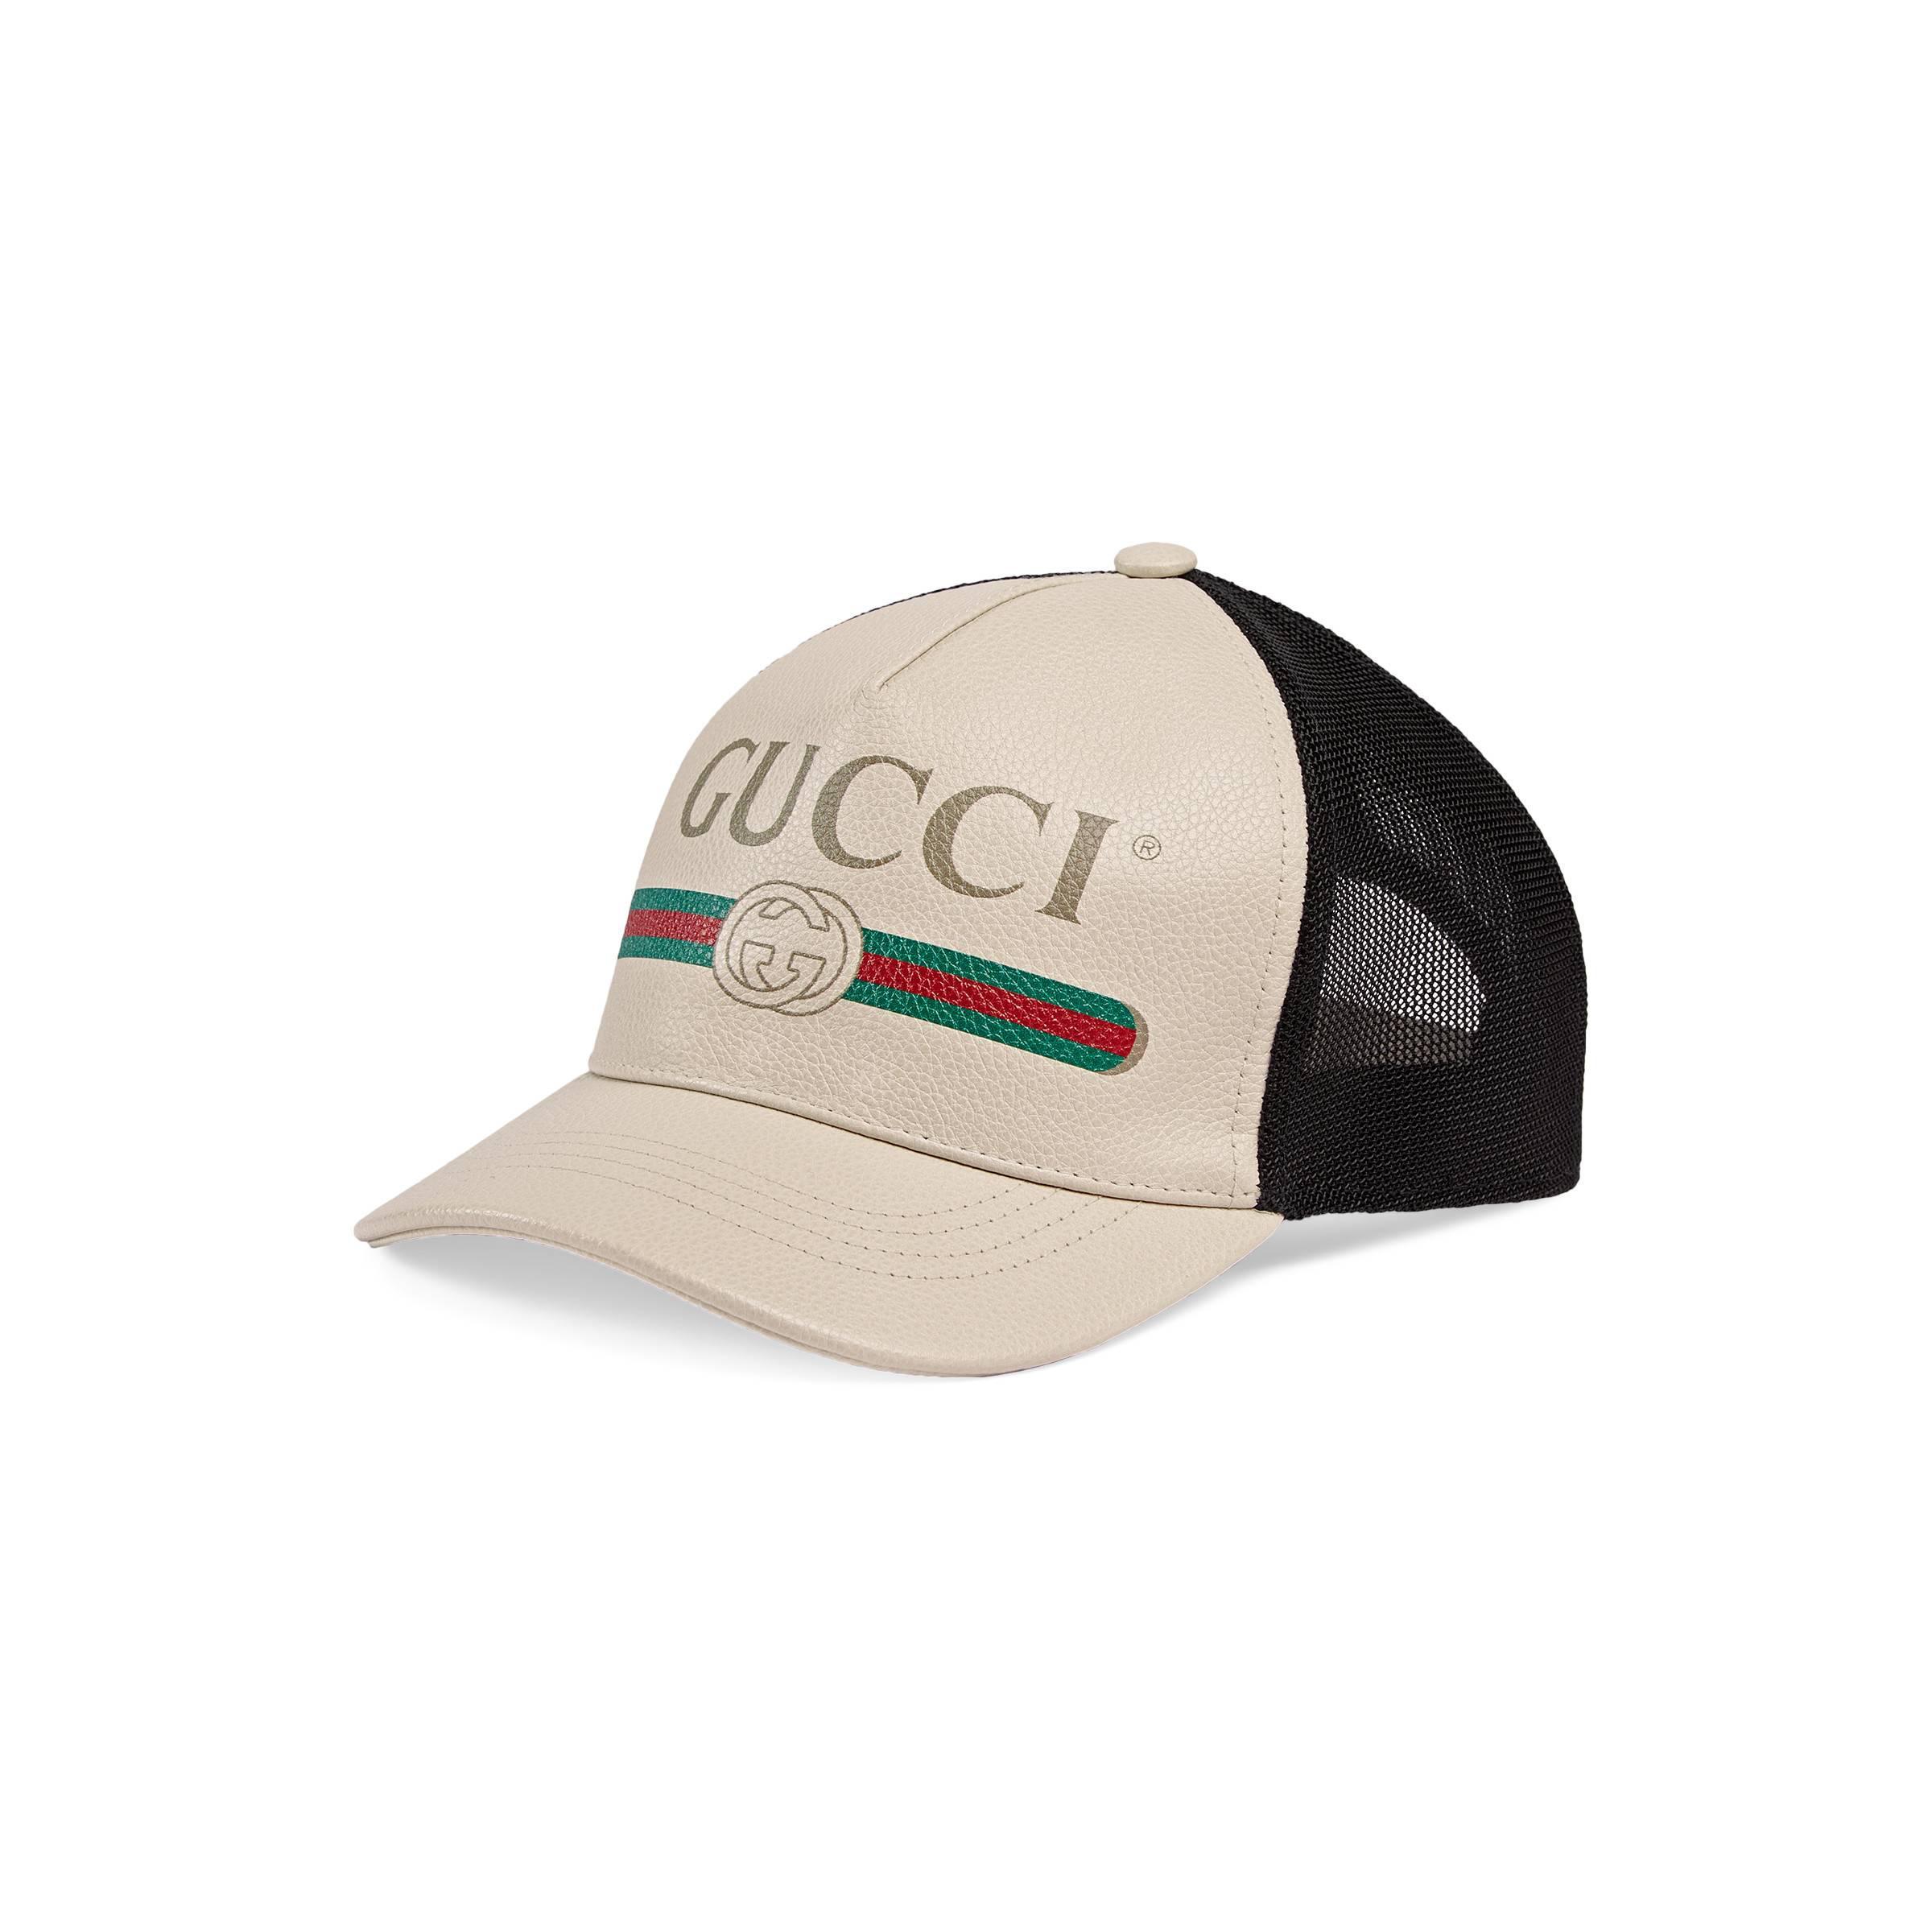 bfb1b5acebf Gucci - White Print Leather Baseball Hat - Lyst. View fullscreen